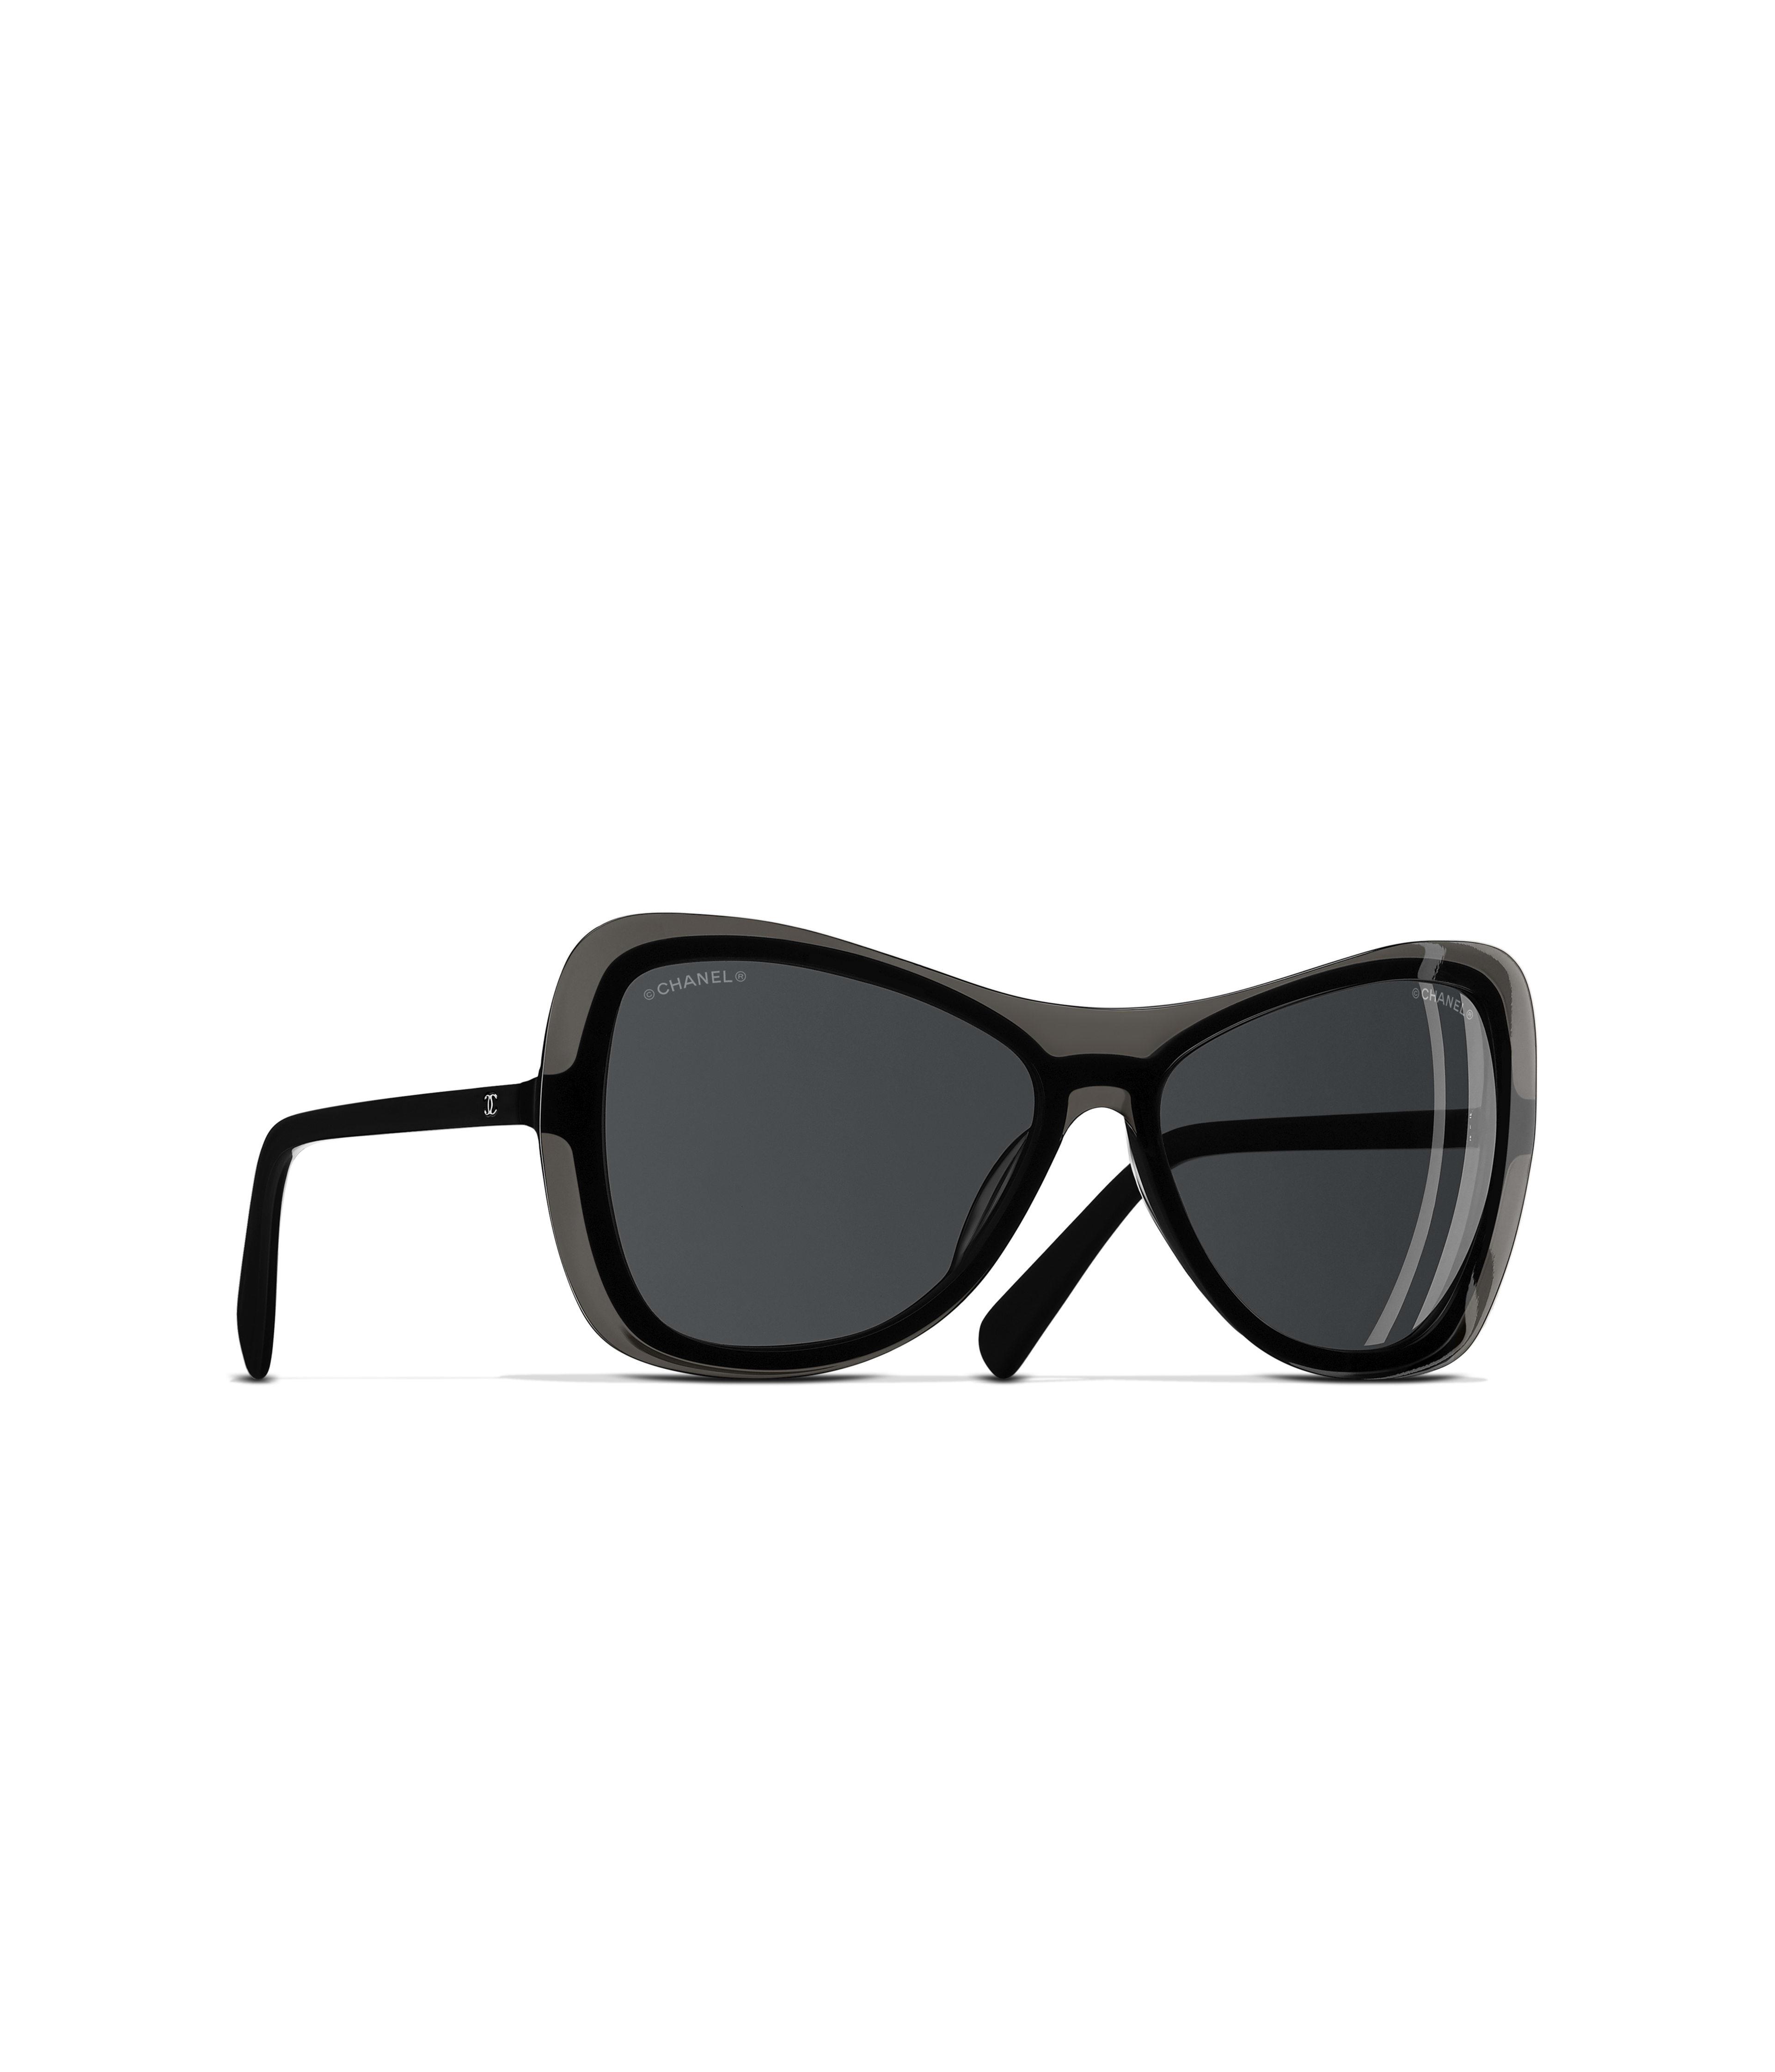 b2d9263c249 Chanel Wayfarer Sunglasses « One More Soul